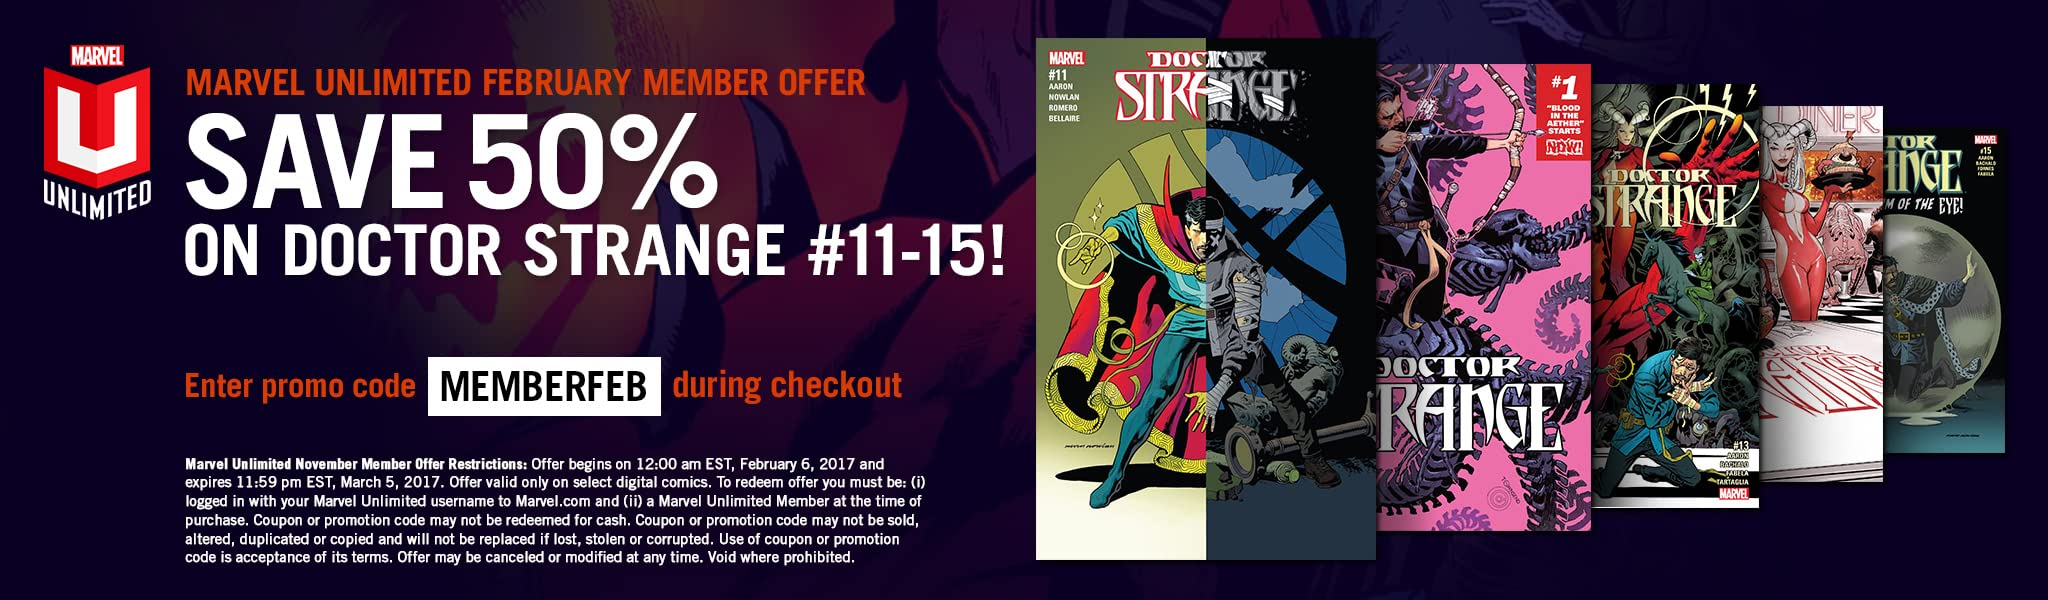 marvel unlimited february 2017 offer marvel comics